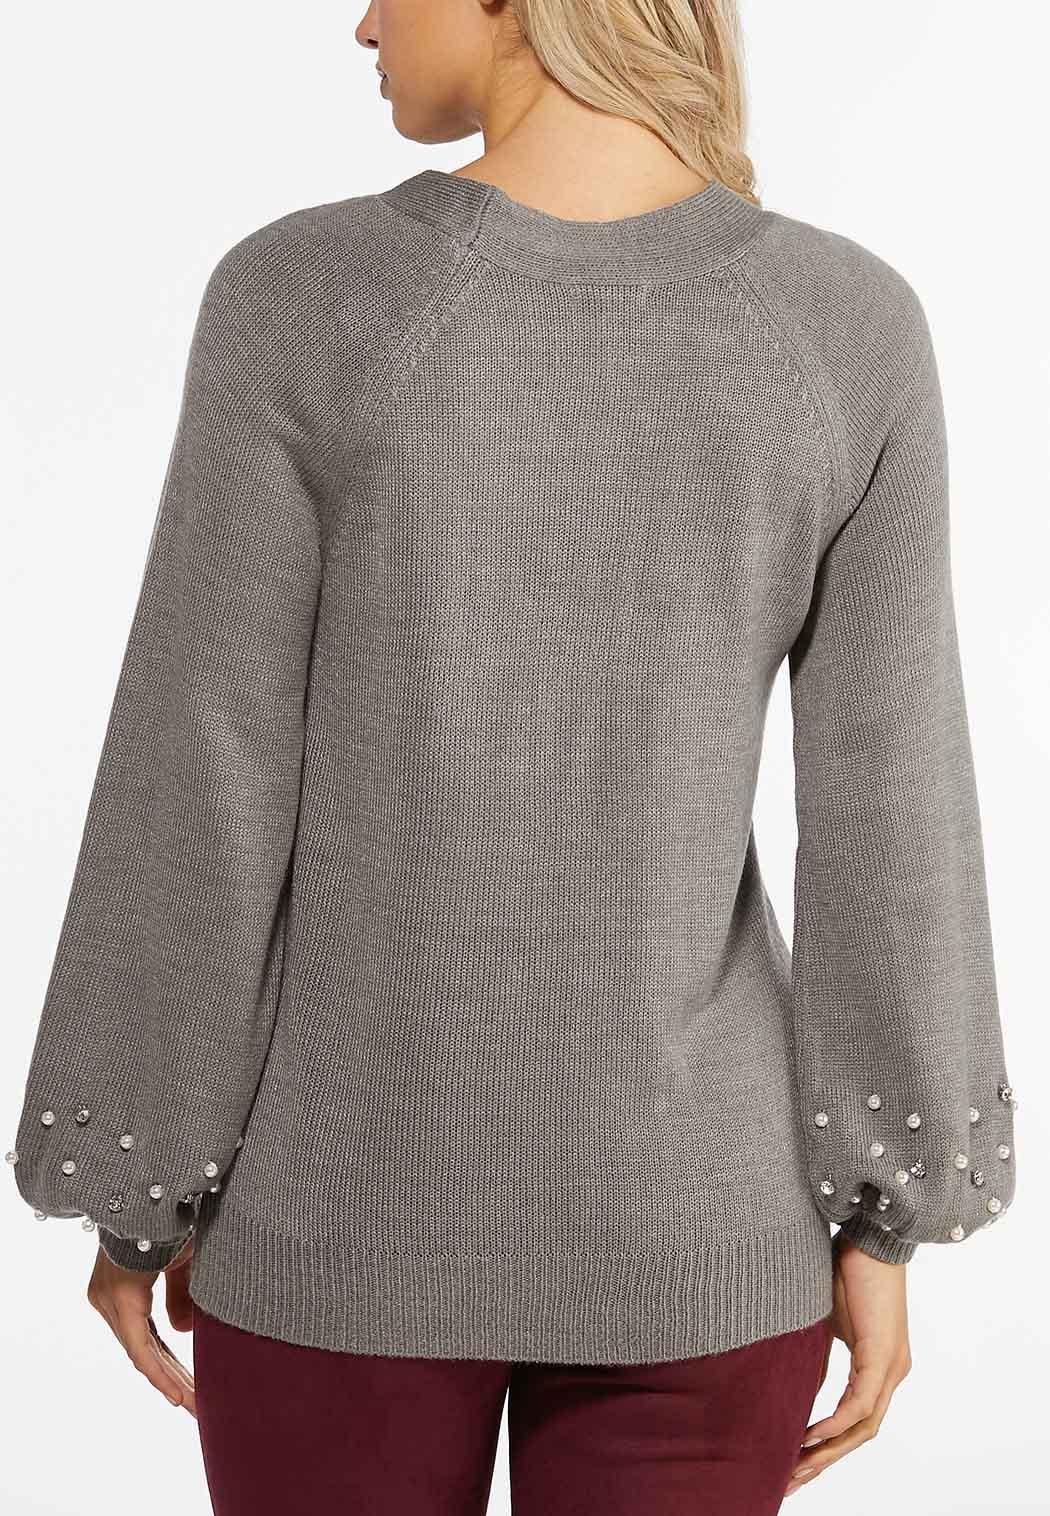 Pearl Trim Balloon Sleeve Sweater (Item #44407678)